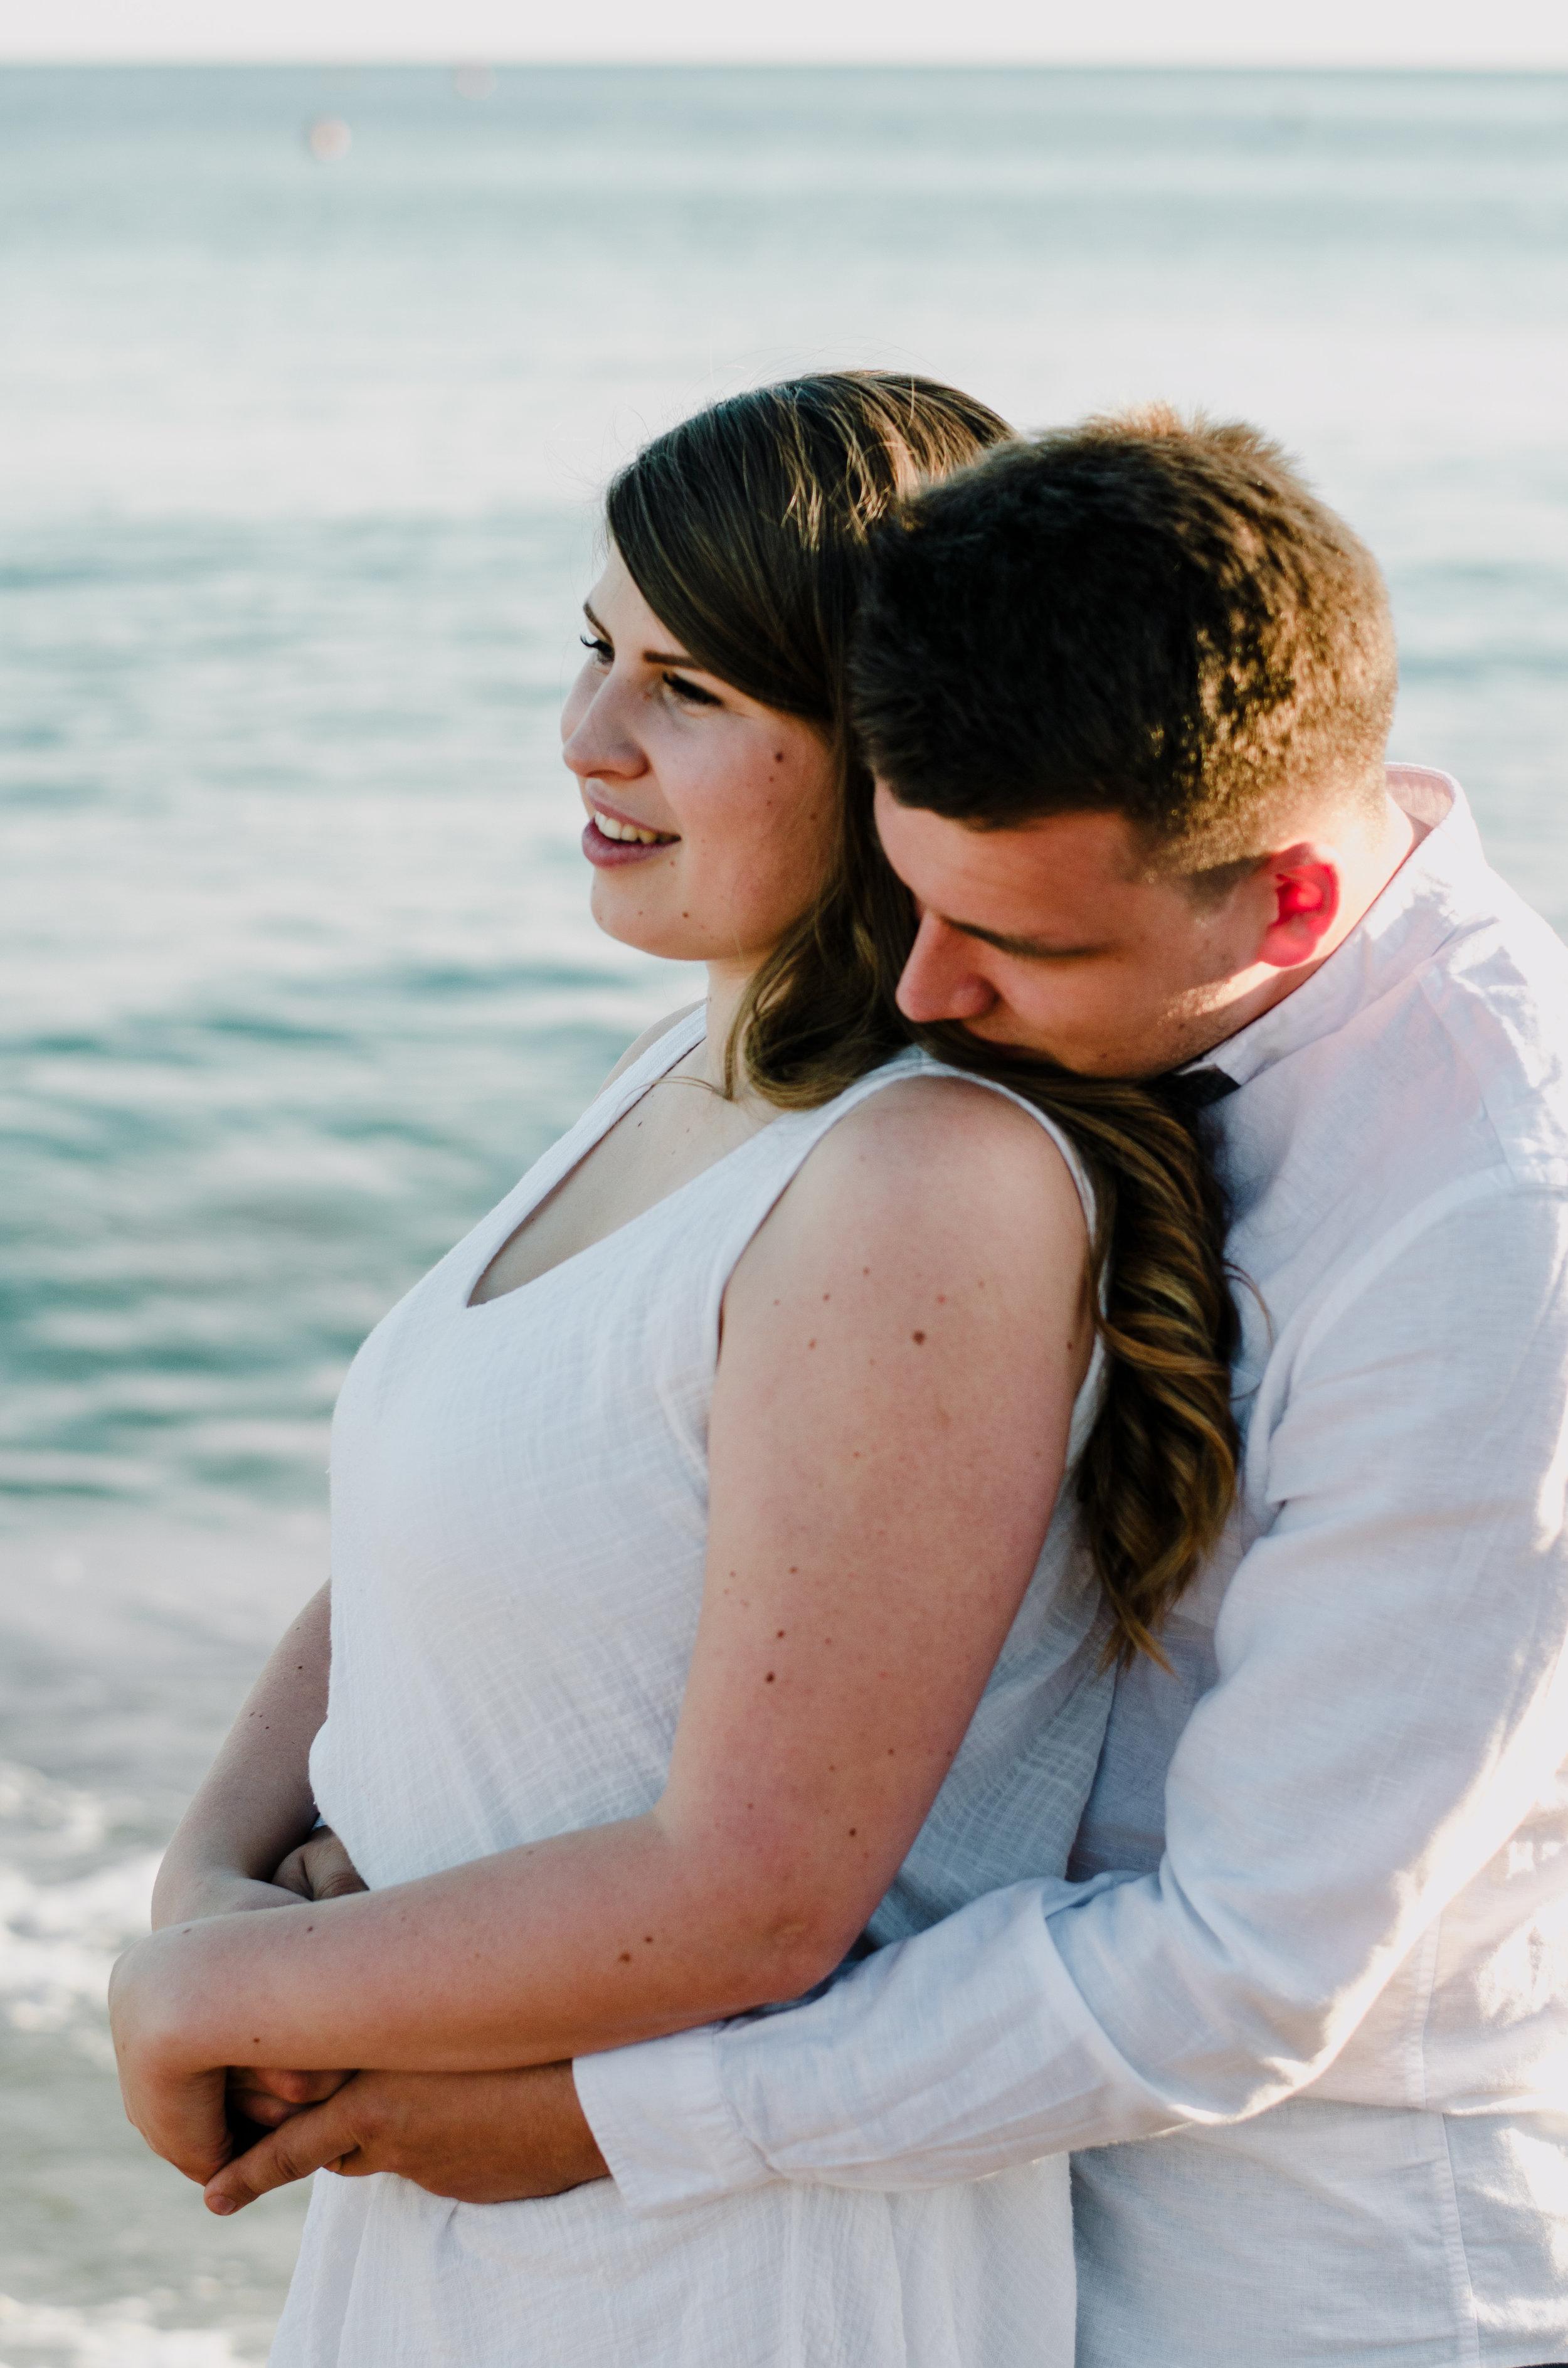 Ieva & Julius - Brighton Beach - Couple Session - Aiste Saulyte Photography-5.jpg